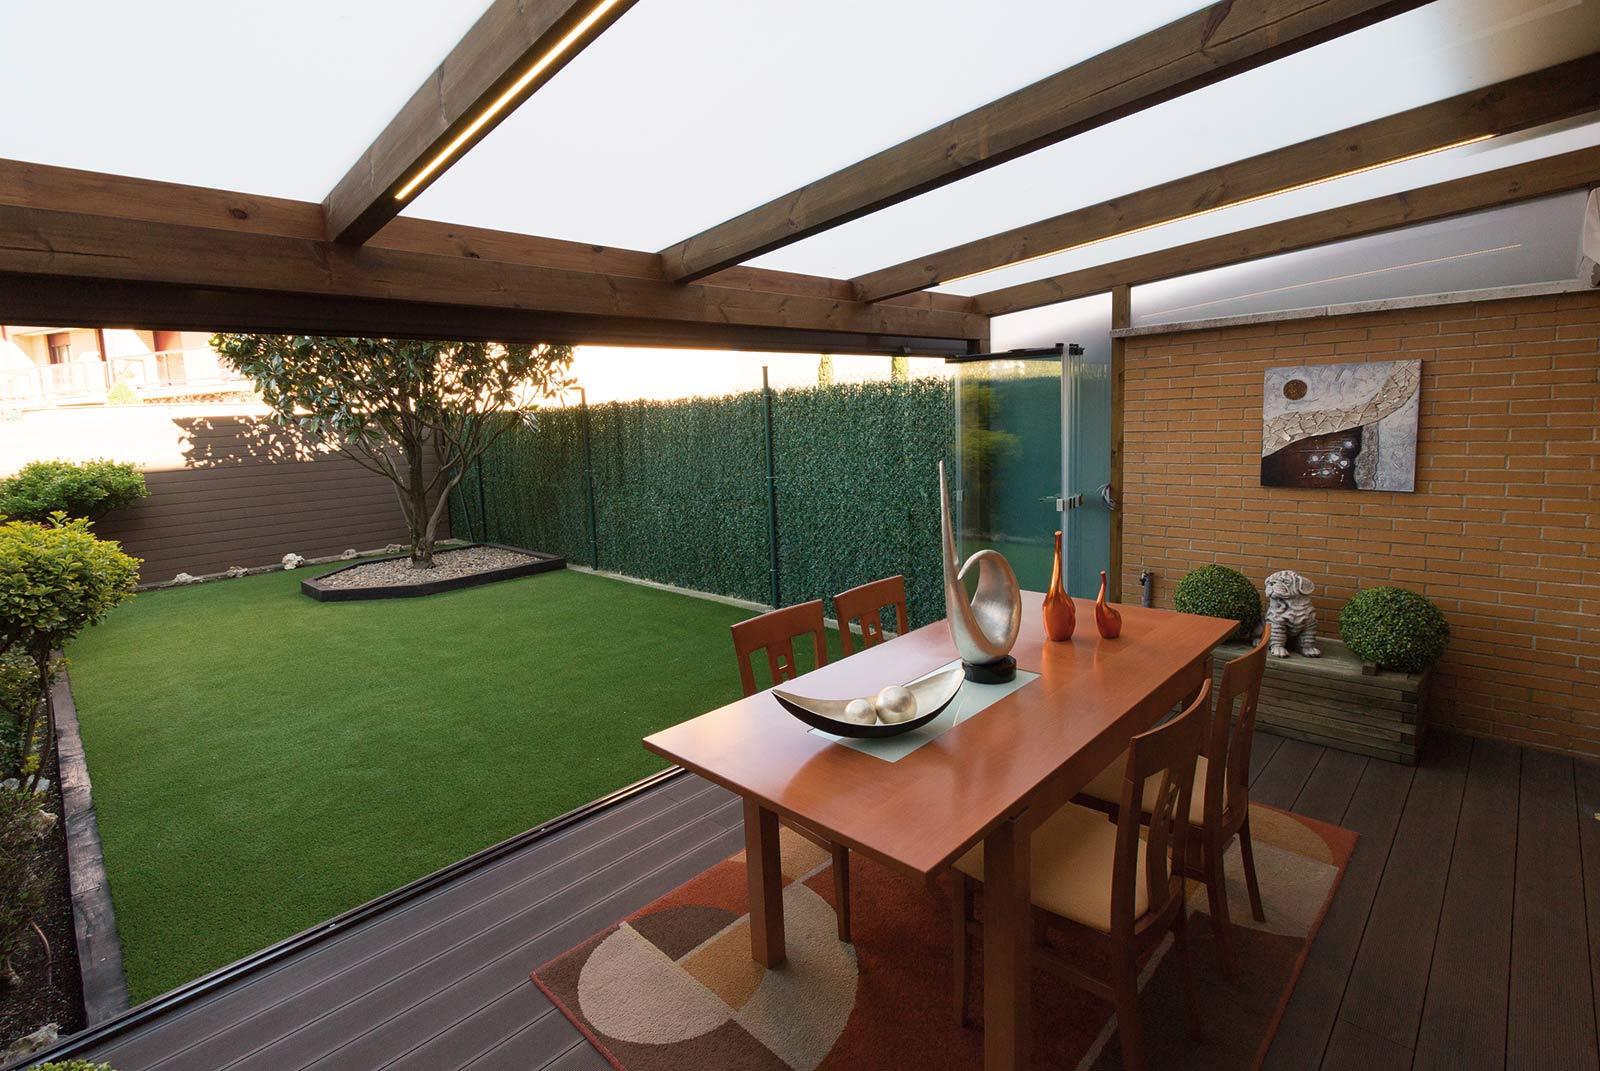 porche-madera-cristal-jardin-unifamiliar-11